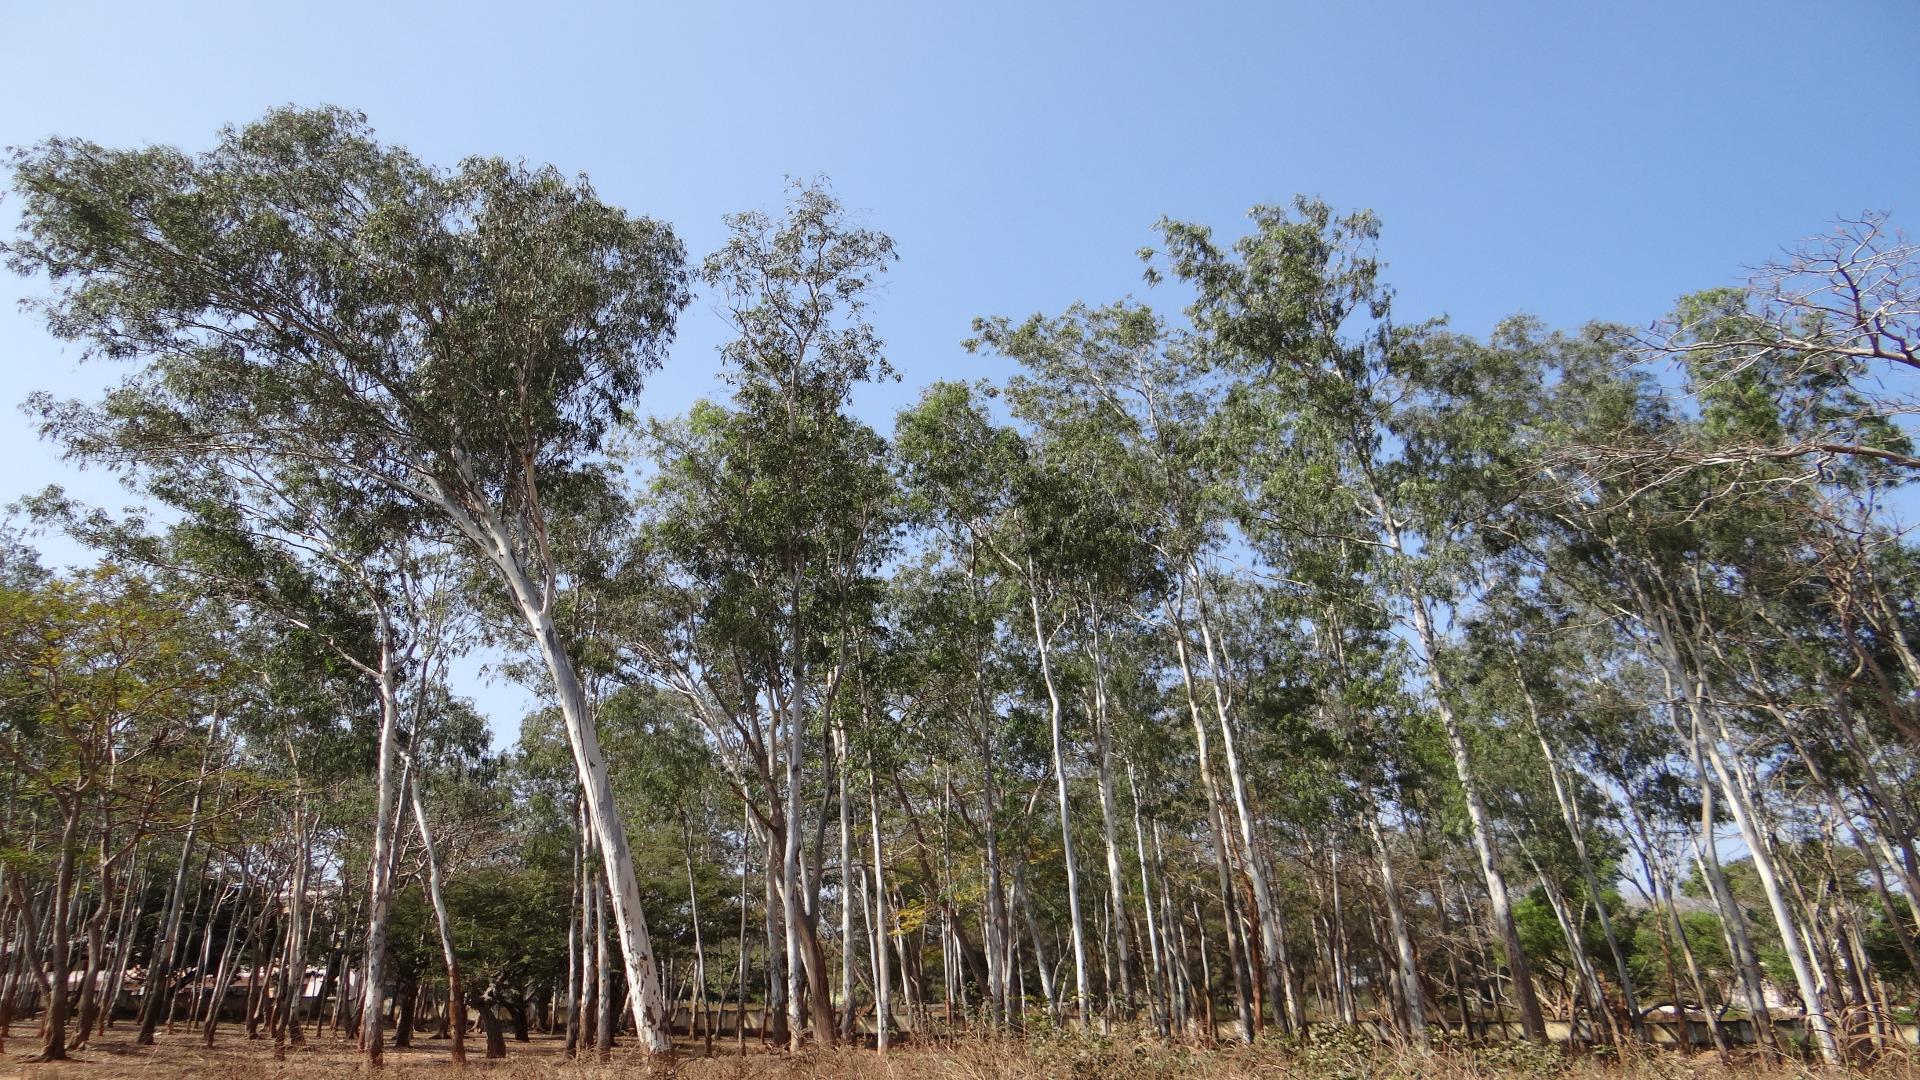 Se-baraja-restringir-la-plantacion-de-eucaliptos-sobre-pinares-cortados.1920